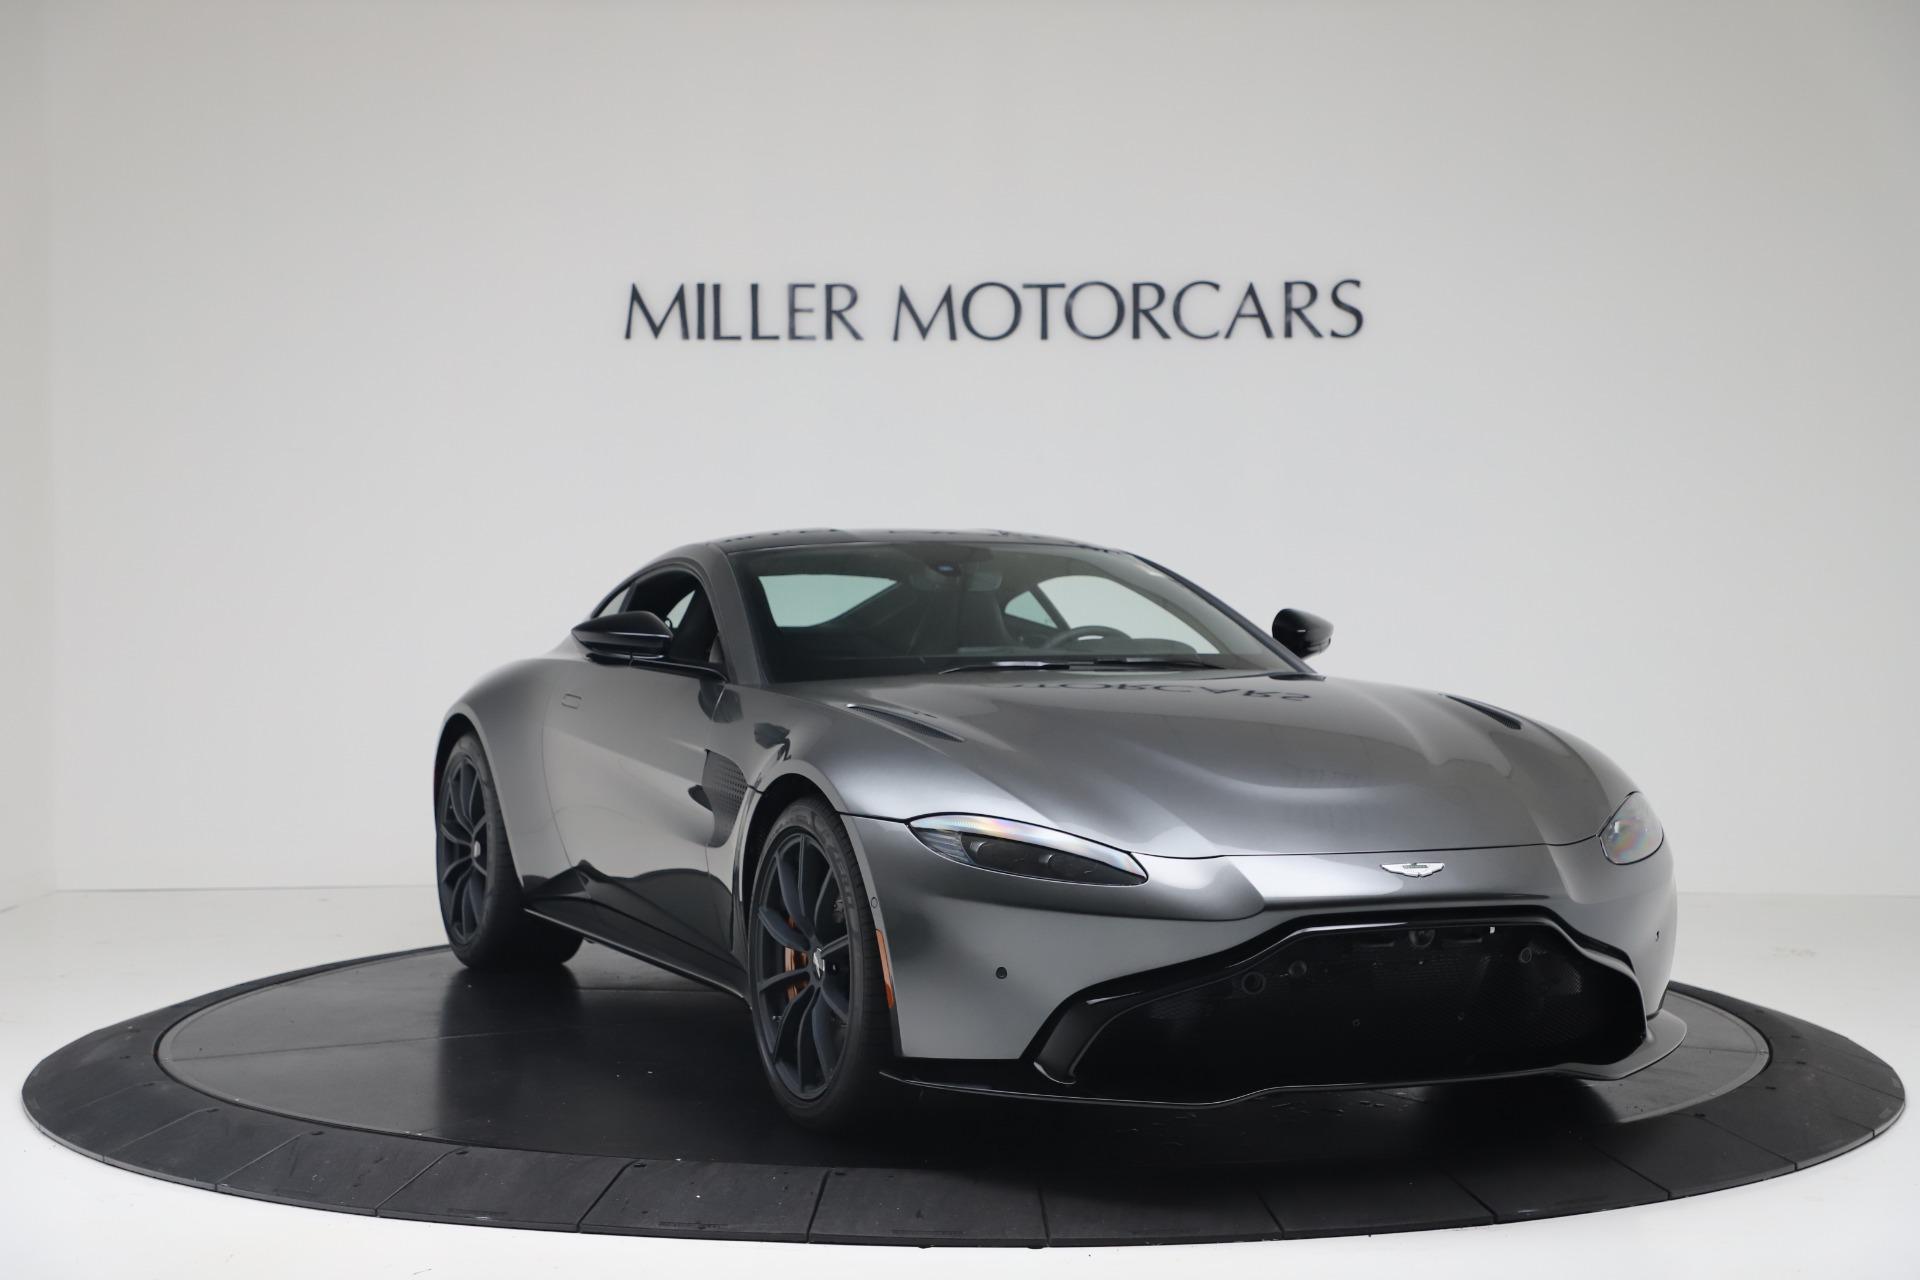 New 2020 Aston Martin Vantage V8 For Sale In Greenwich, CT 3408_p12